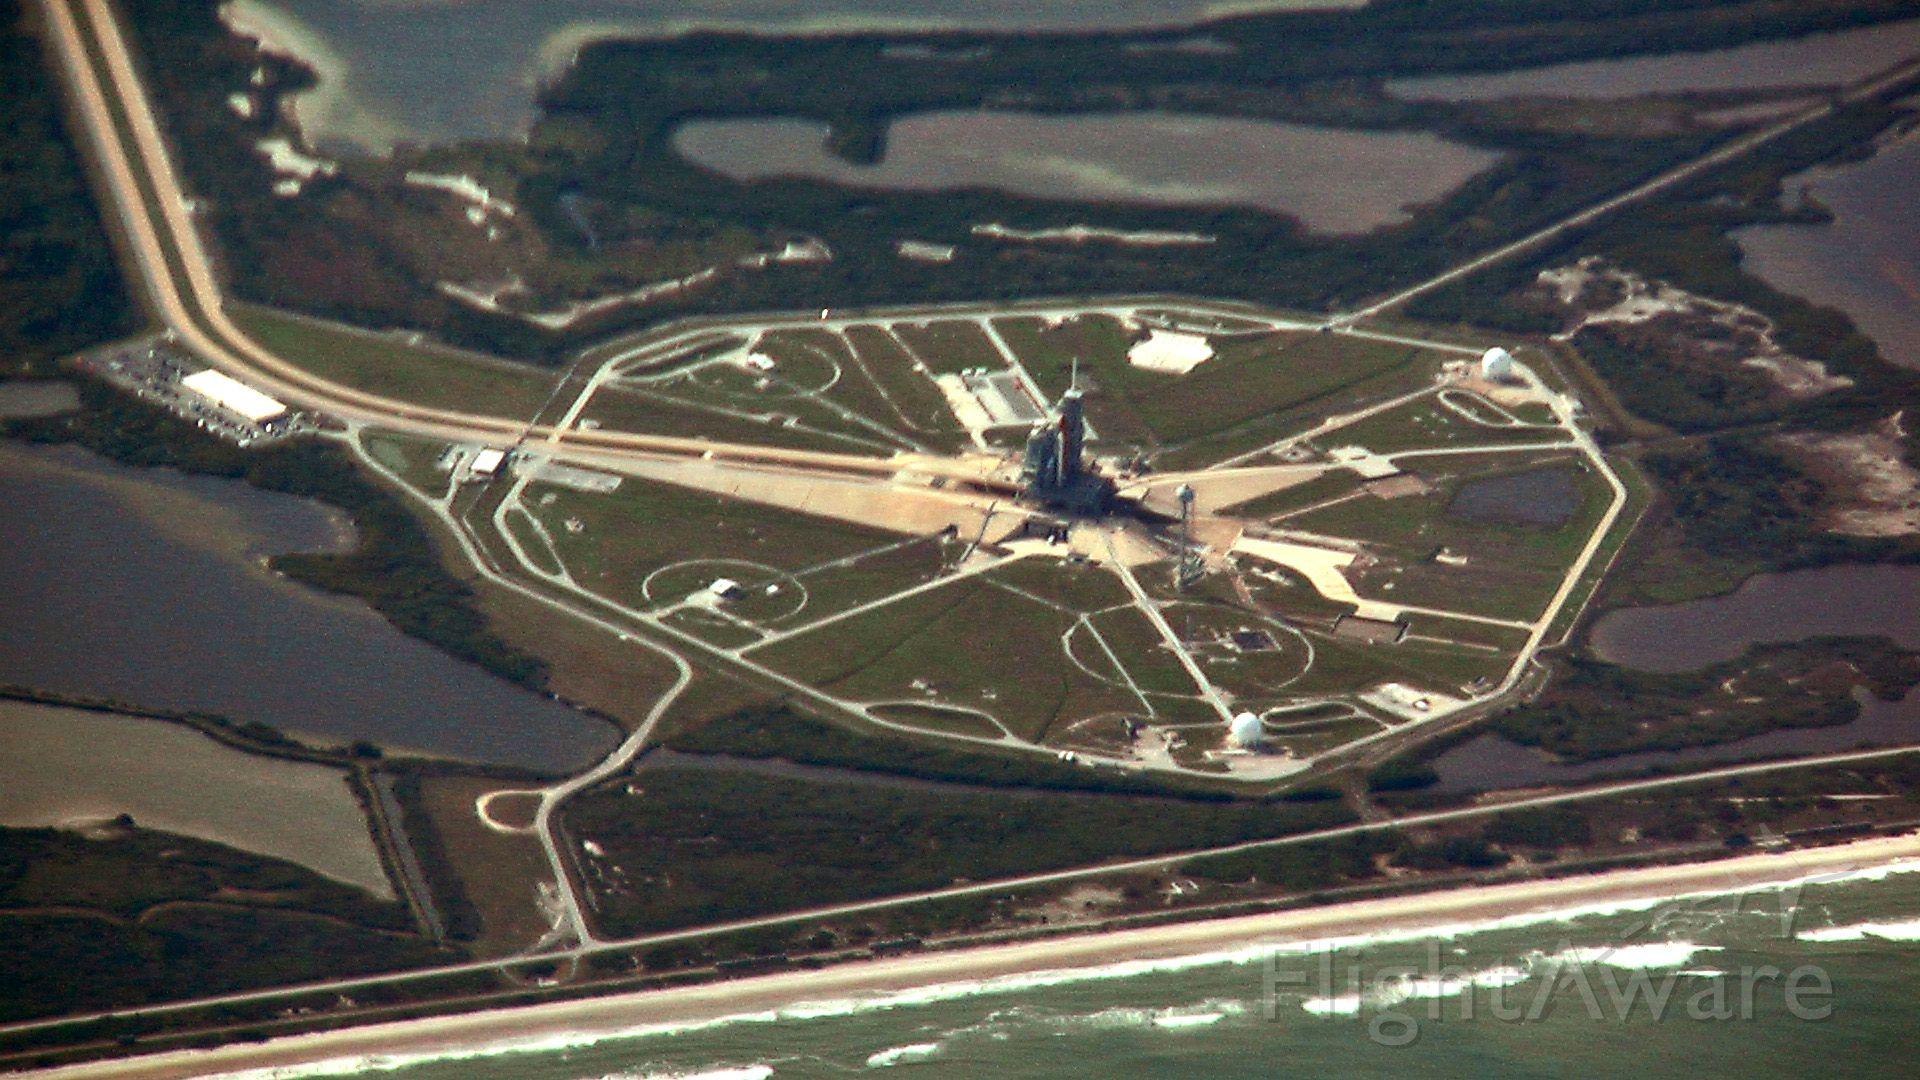 — — - Atlantis on pad 39A.